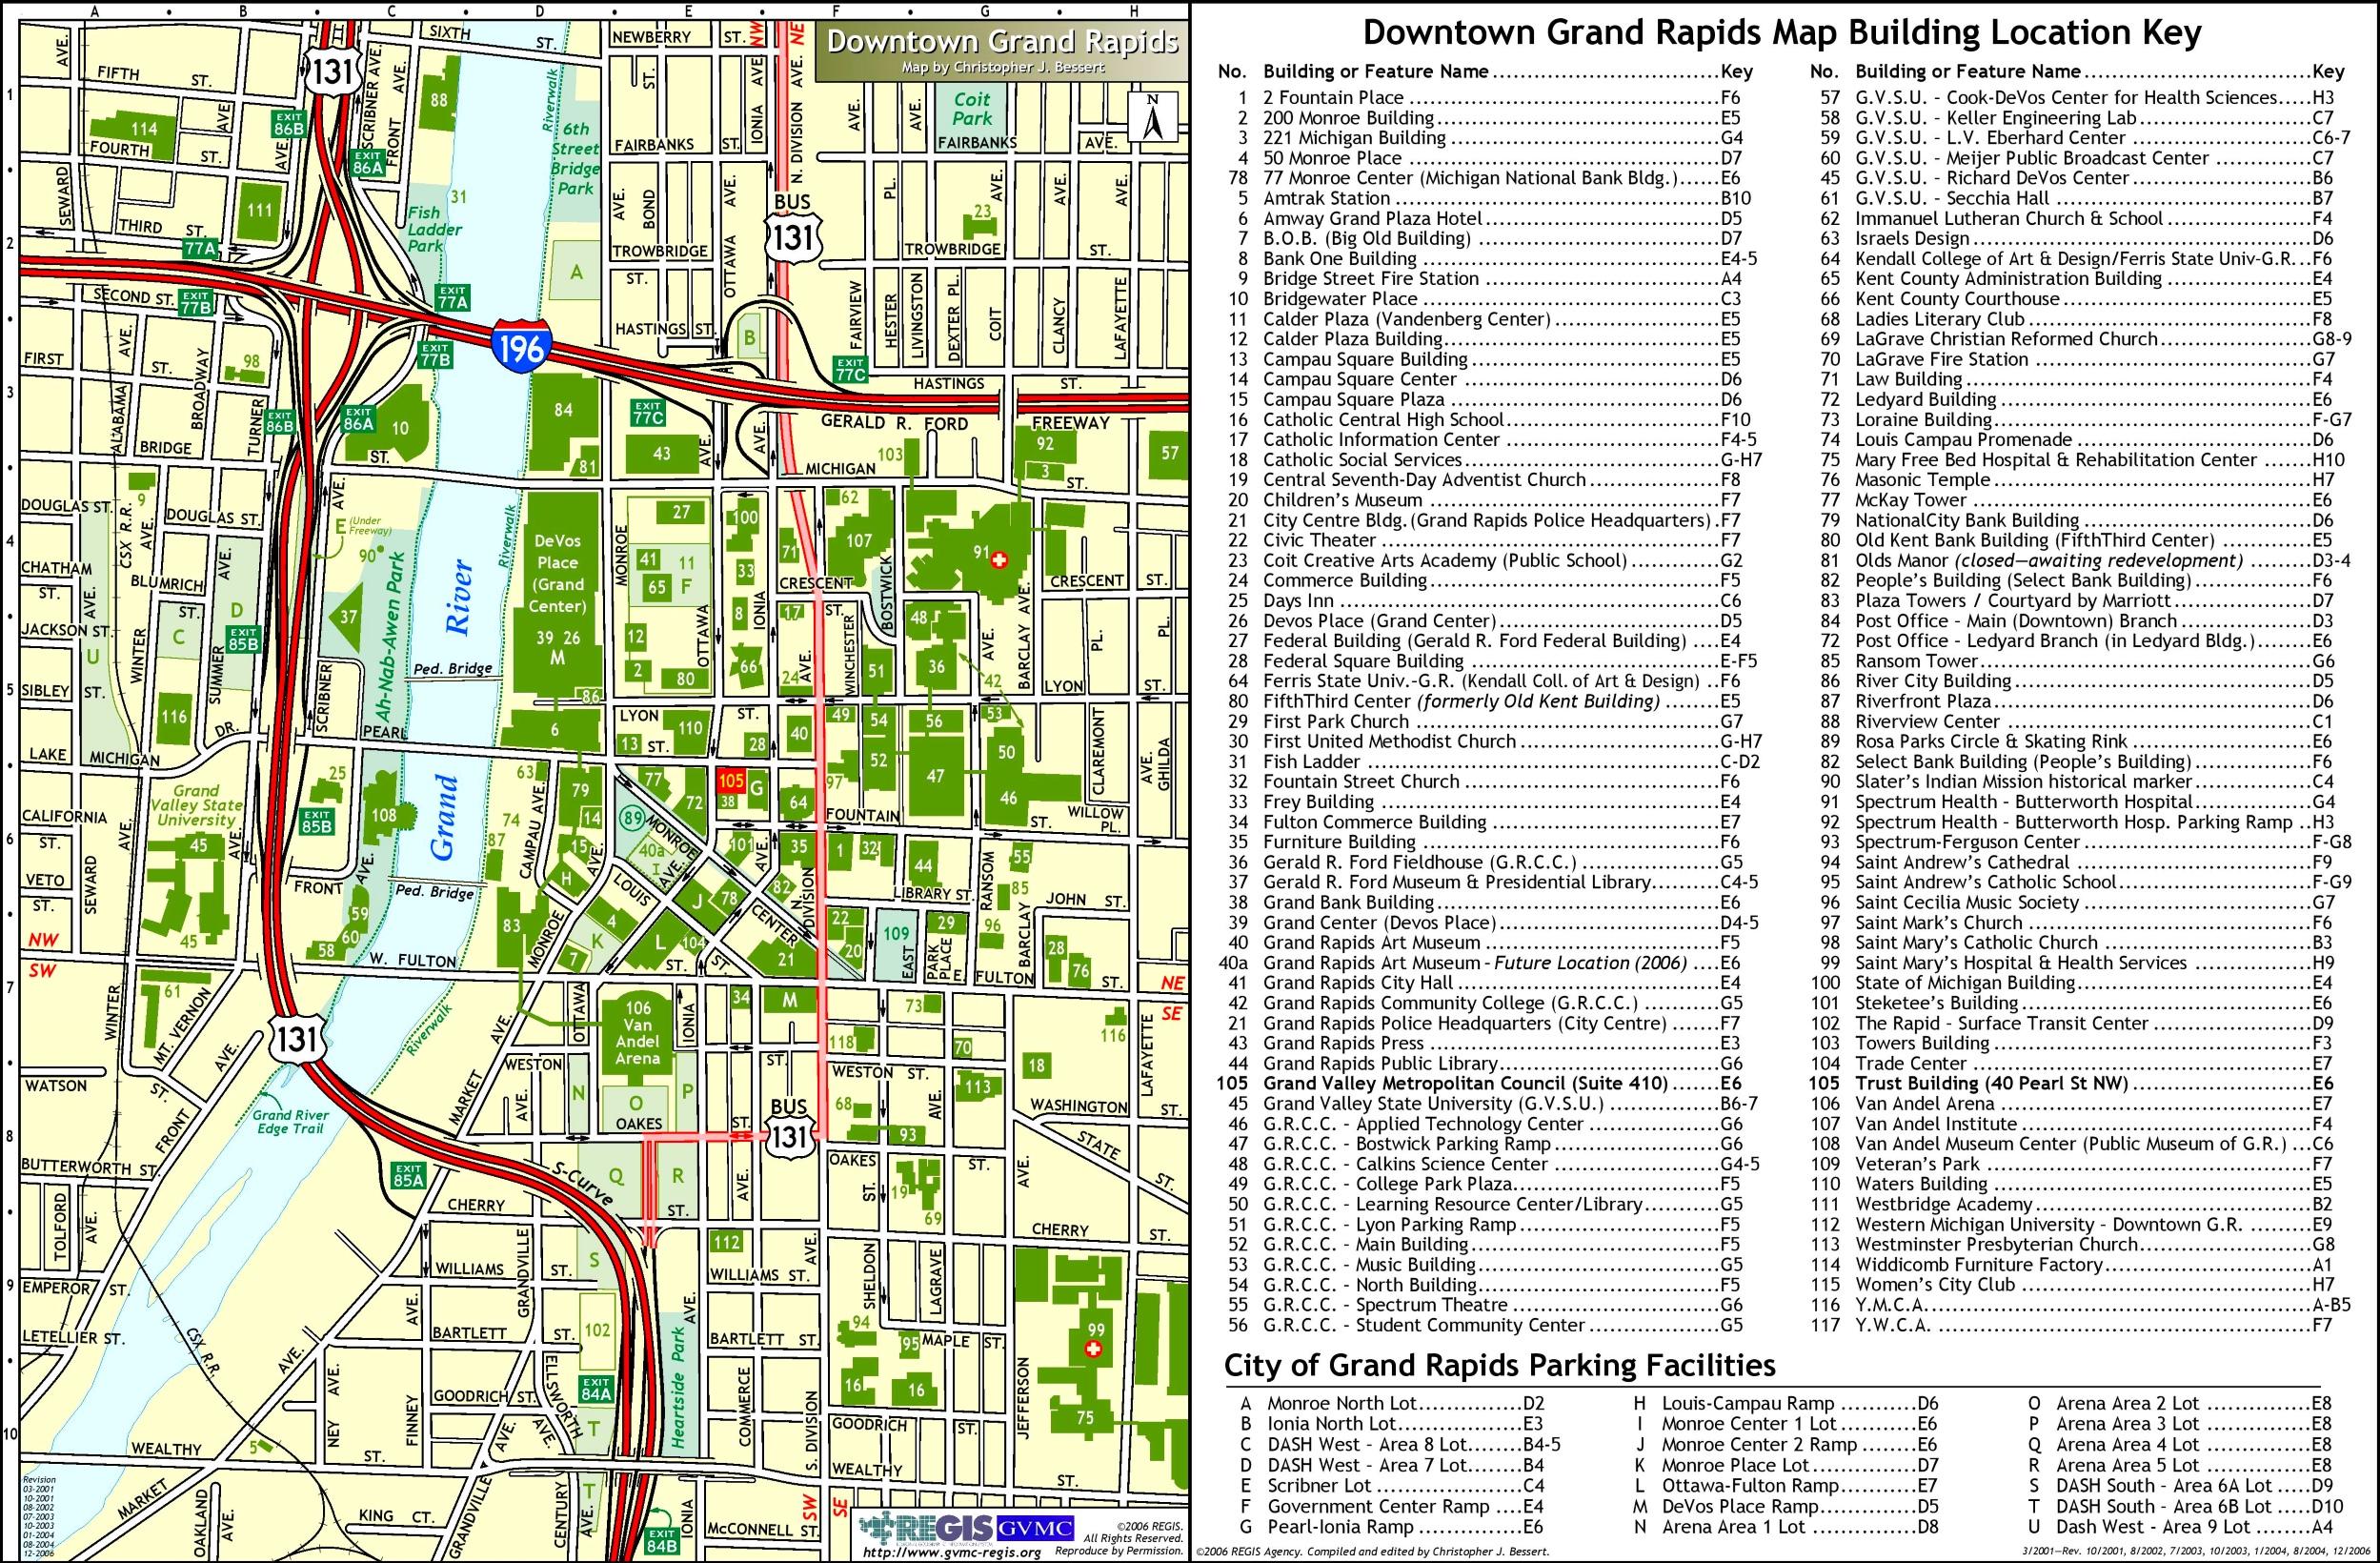 Grand Rapids Downtown Buildings Map